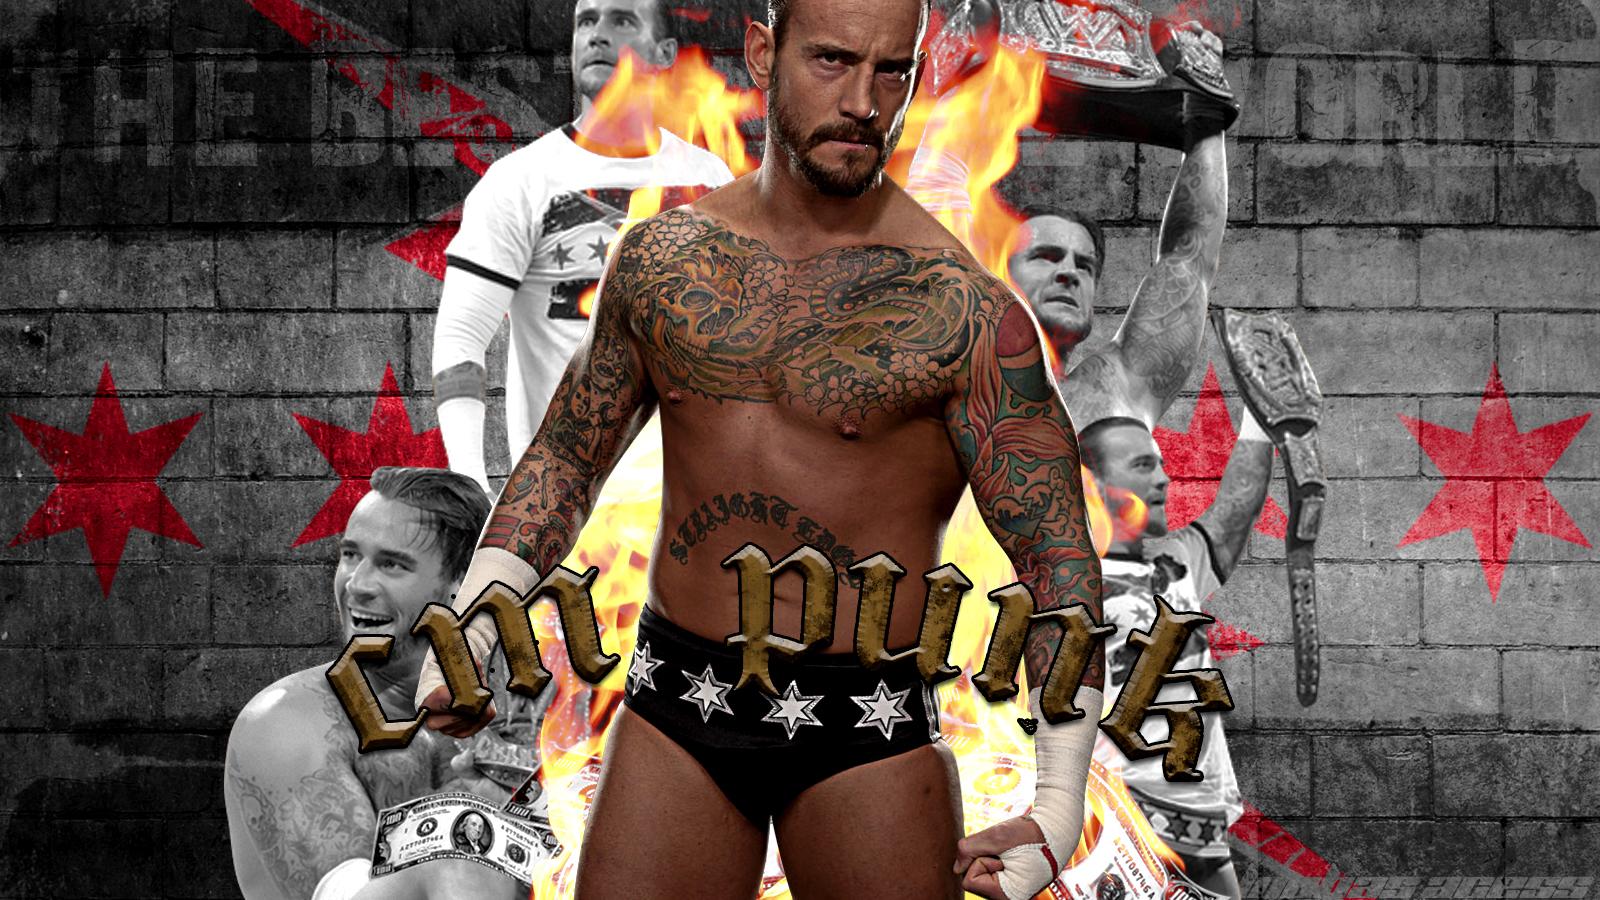 http://1.bp.blogspot.com/-TEljVOZPKOg/UER9N_wSDTI/AAAAAAAAAmQ/Pgm92t45z9o/s1600/WWE+CM+Punk+hd+Wallpapers+2012_3.jpg